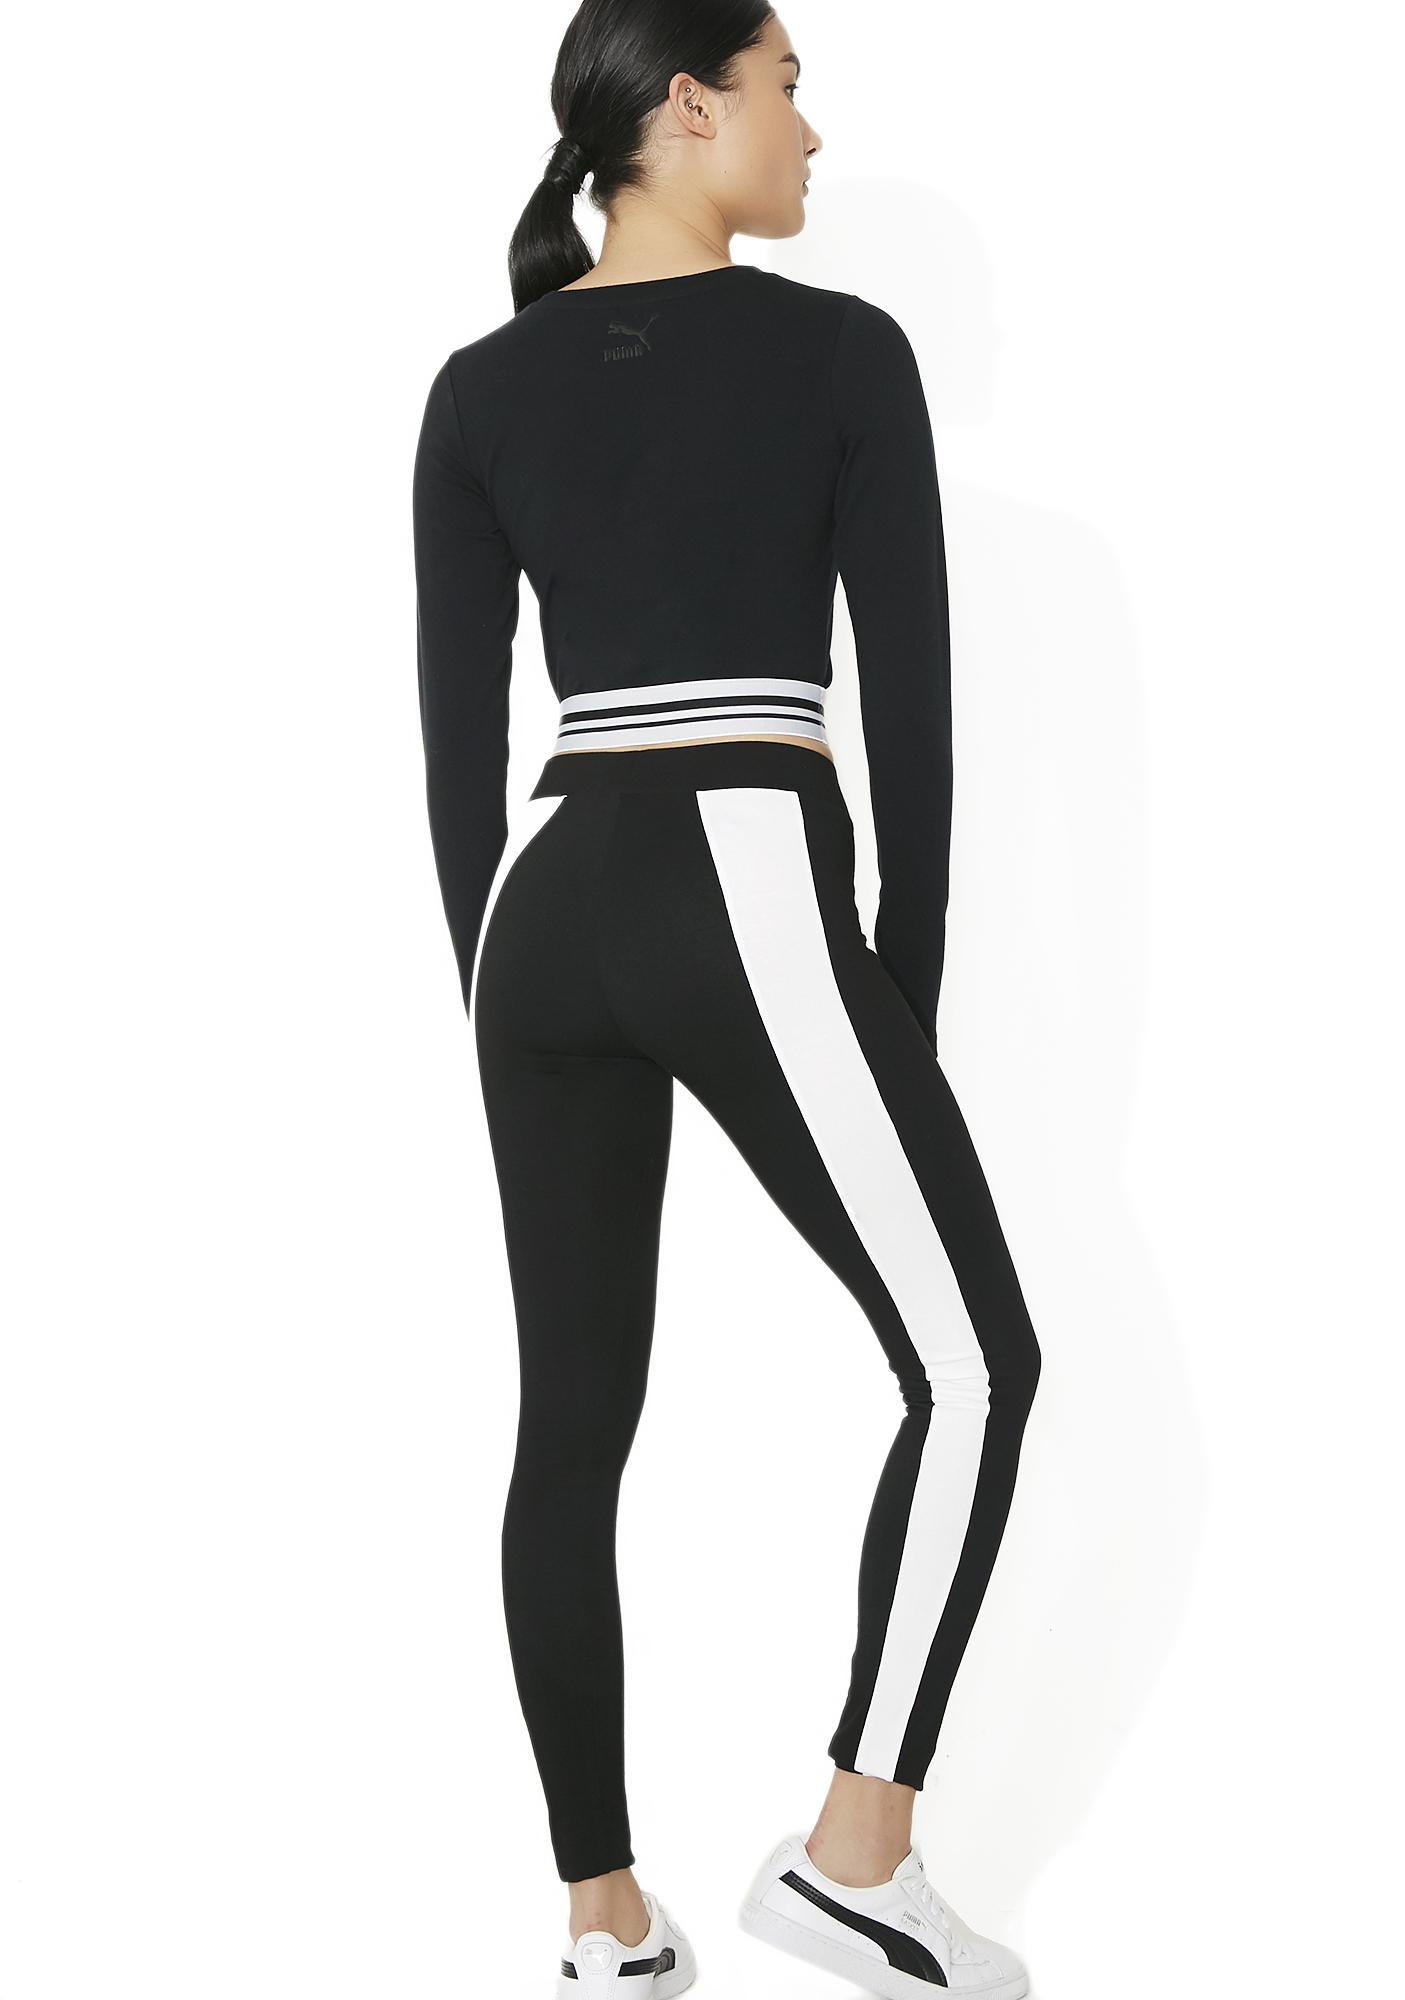 PUMA Archive Logo T7 Leggings